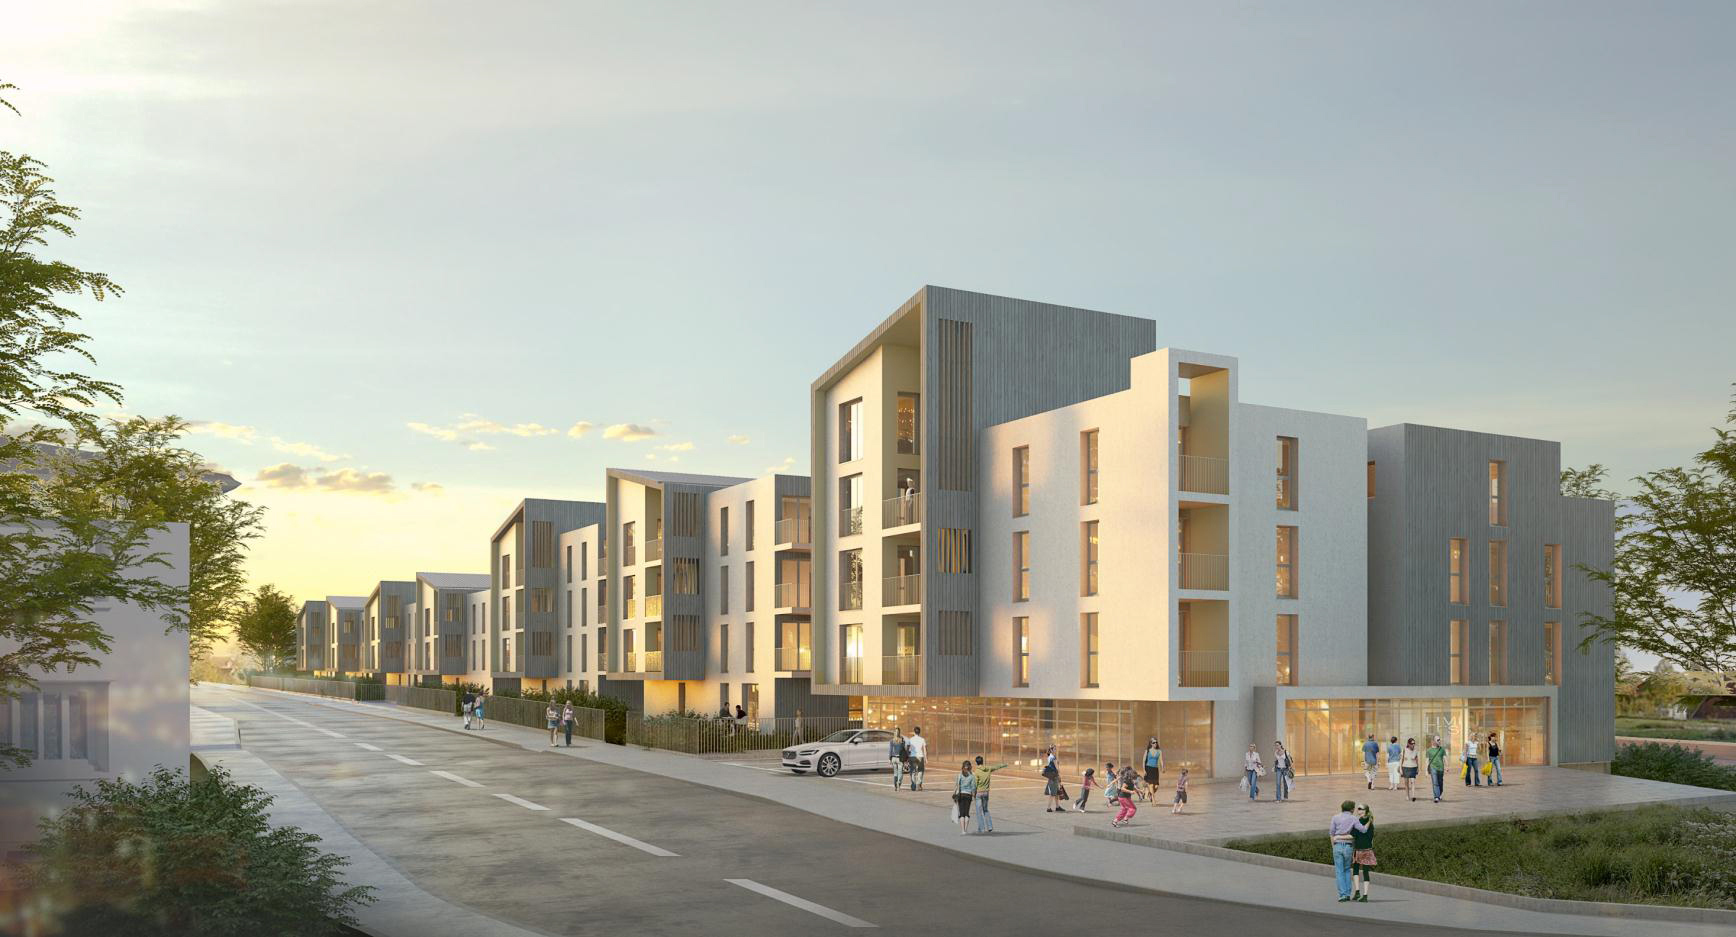 troyes_collective_housing_public_outdoor_design_christophe_gautrand_landscape_7.jpg